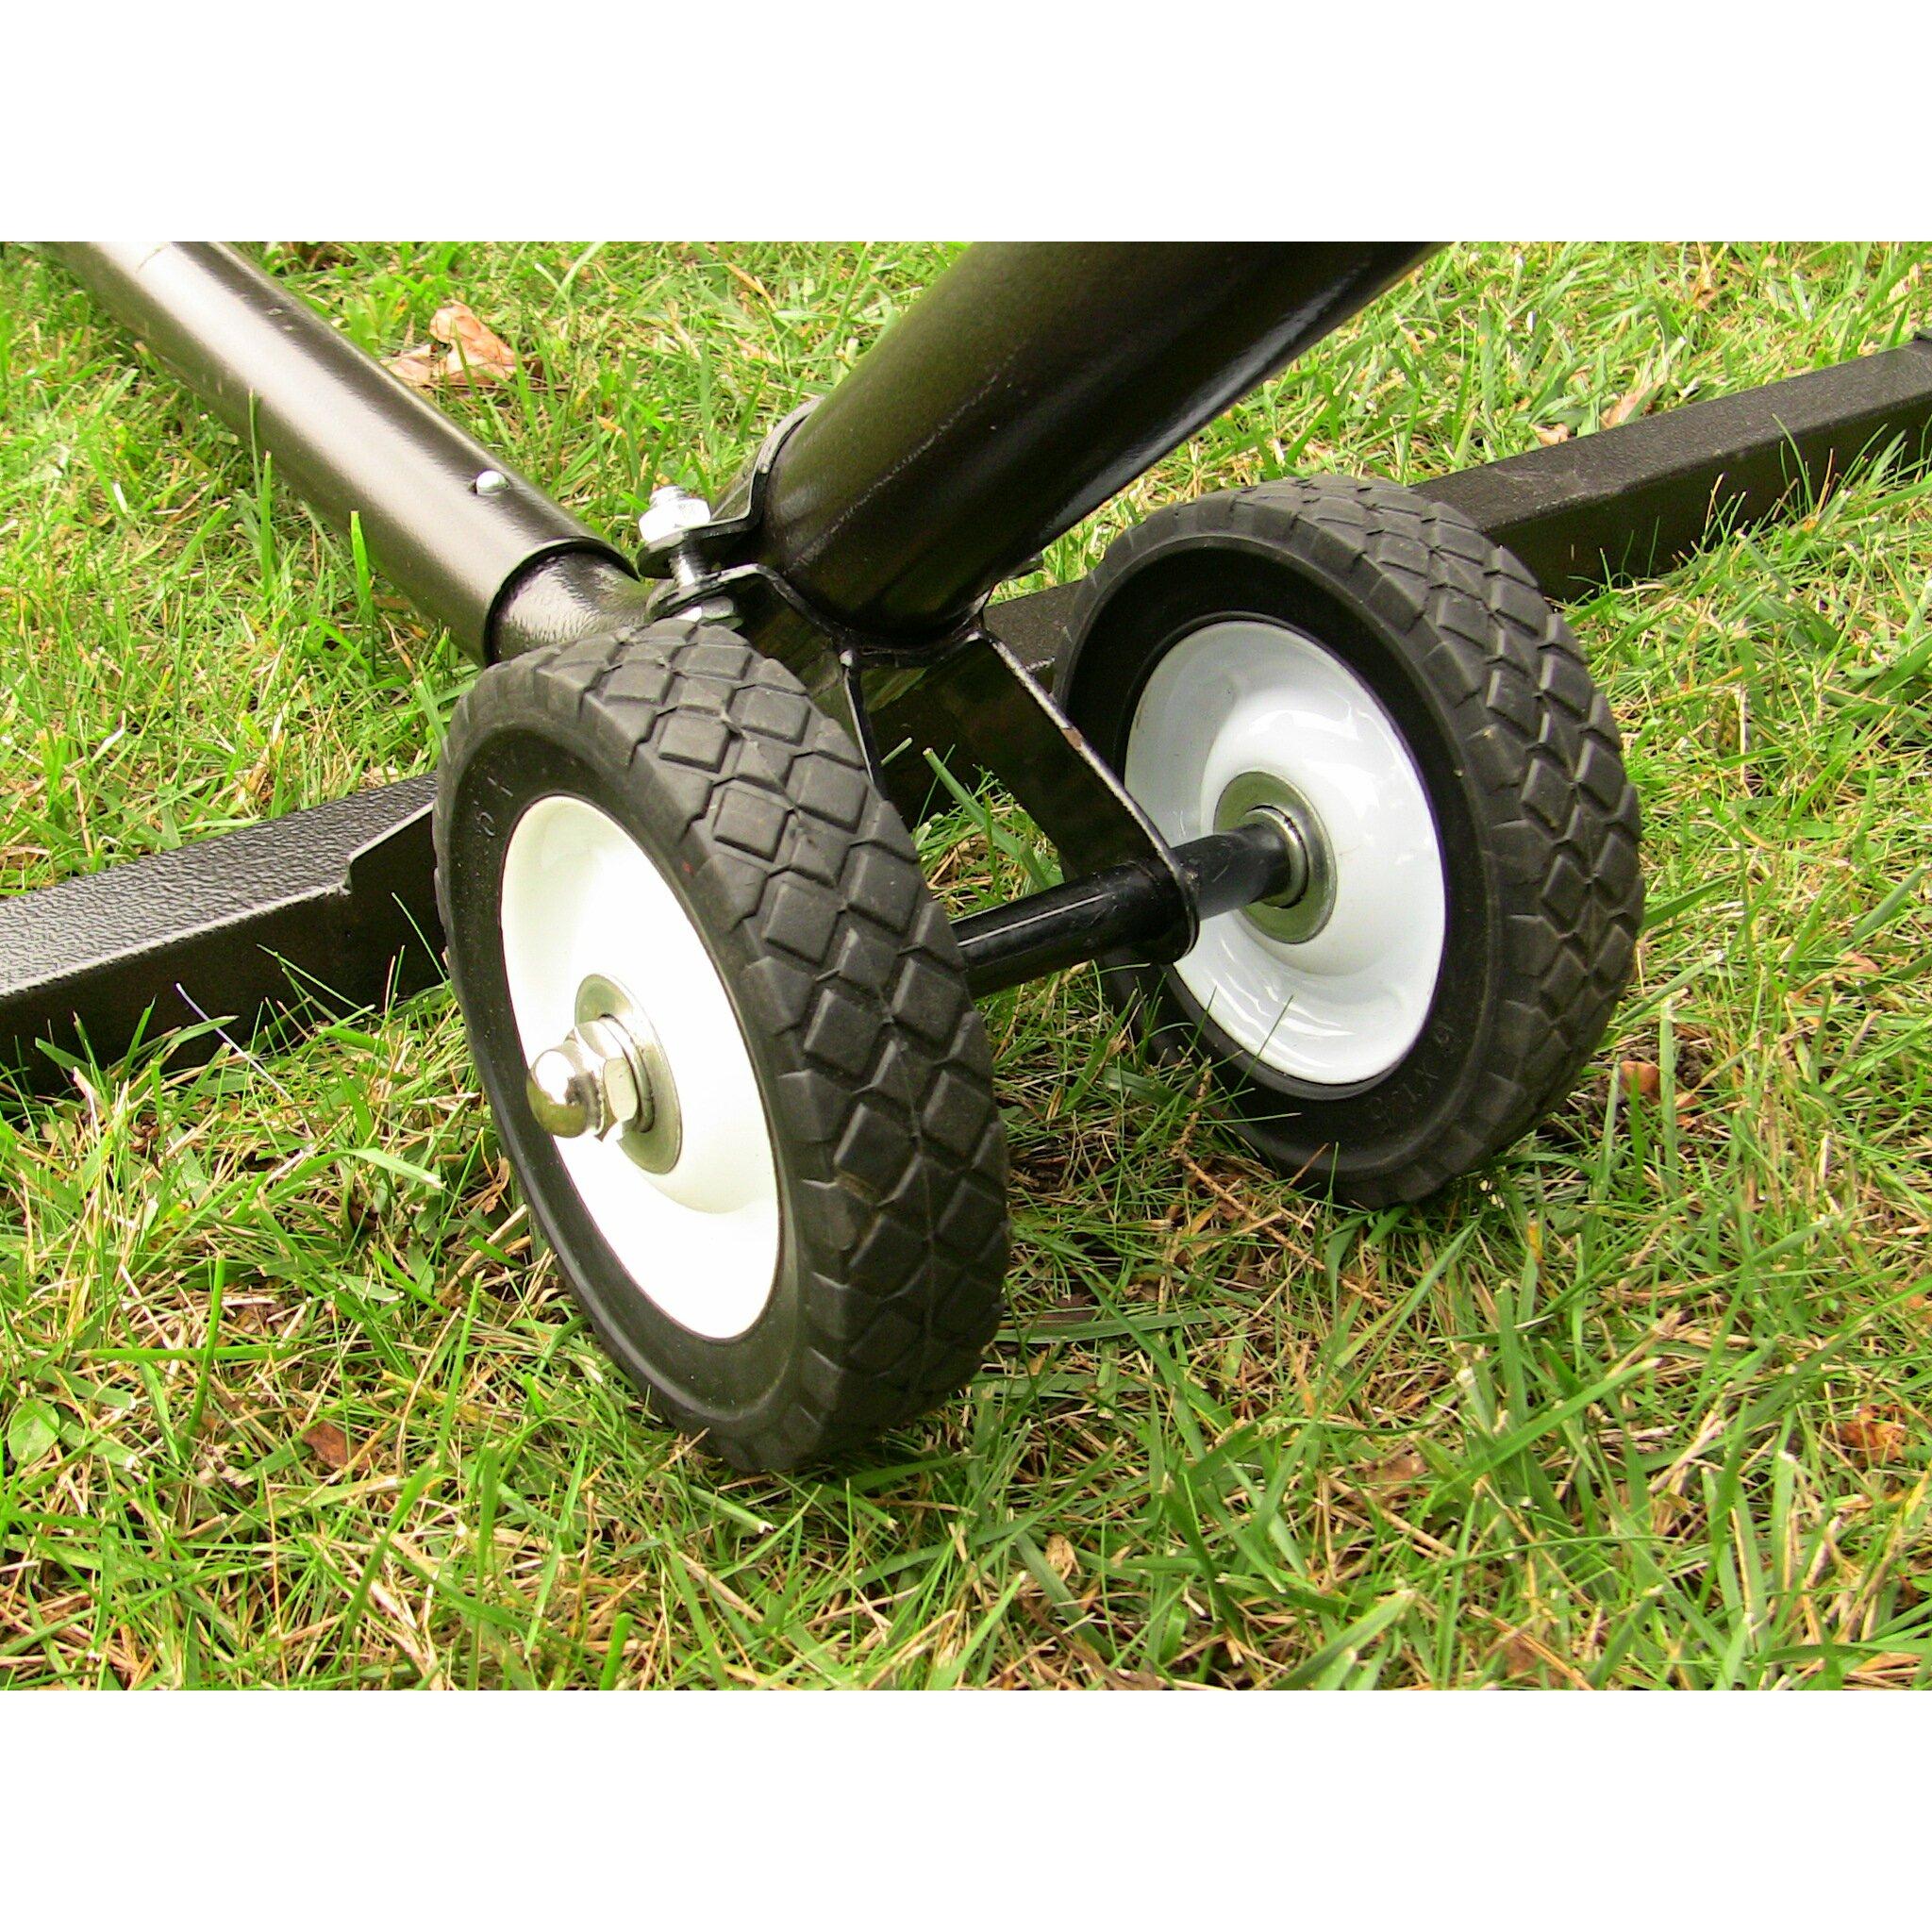 Vivere Hammocks Hammock Stand Wheel Kit & Reviews | Wayfair